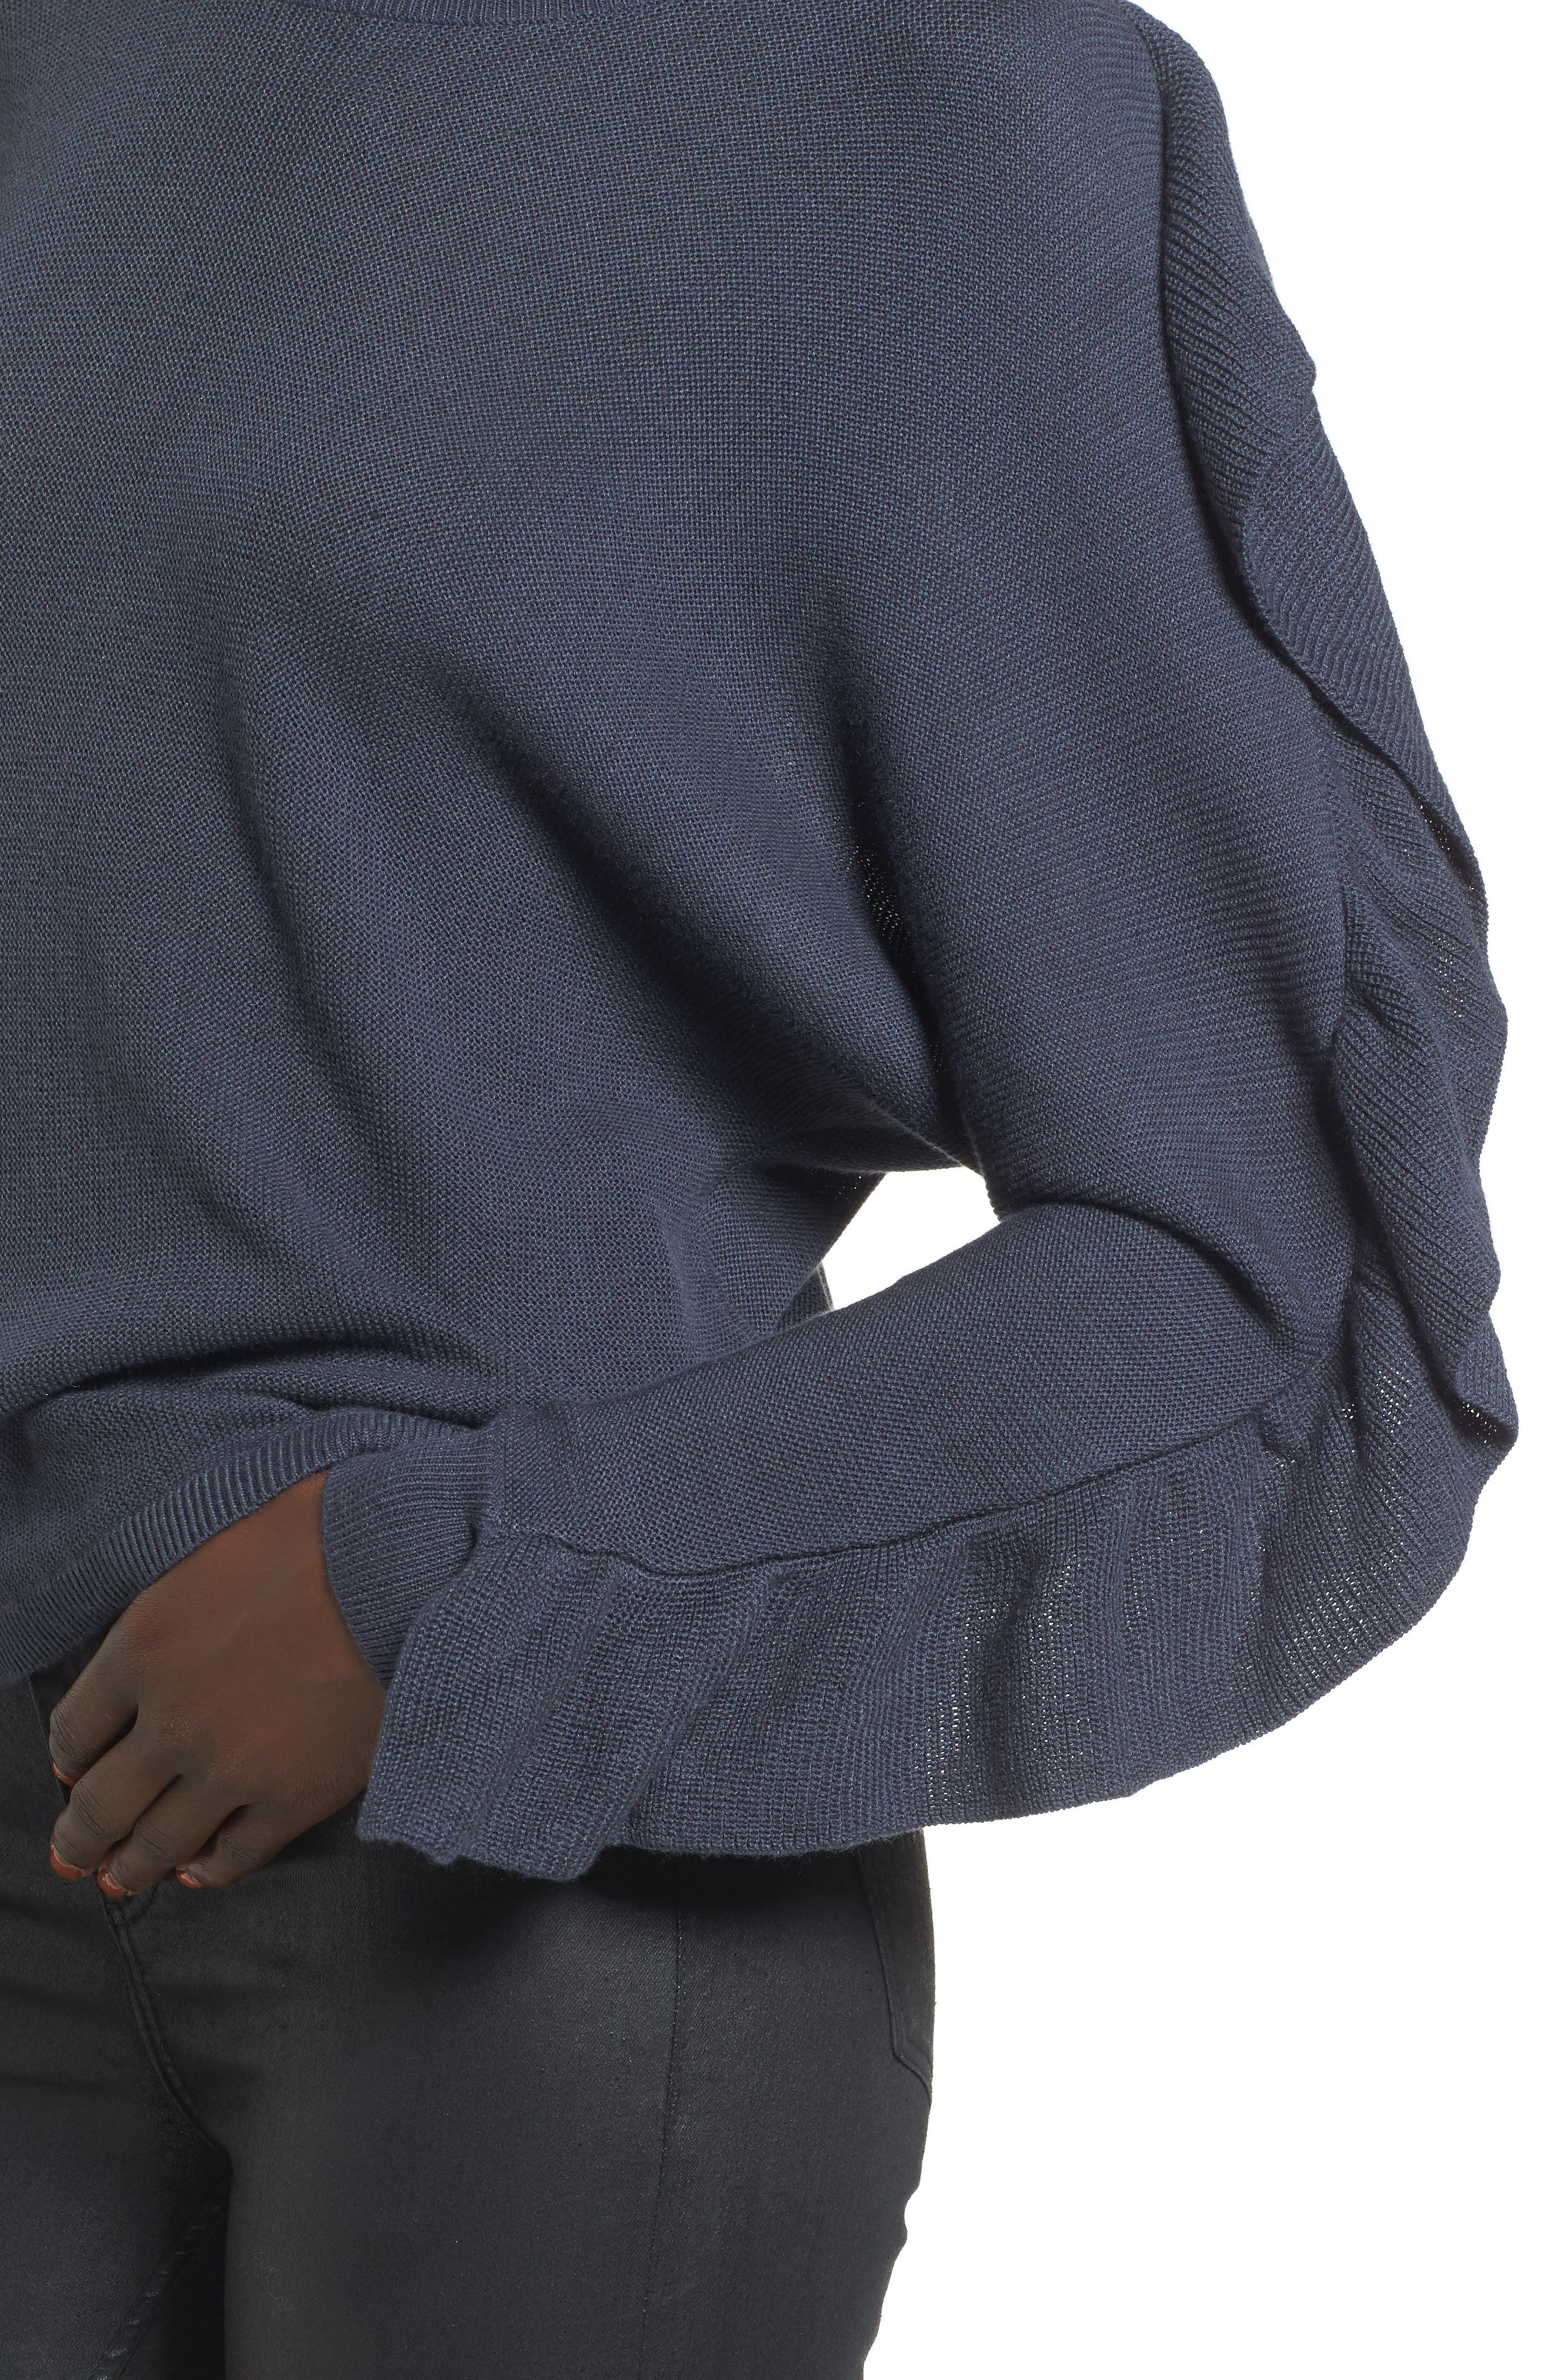 Ruffle Sleeve Sweater,                             Alternate thumbnail 13, color,